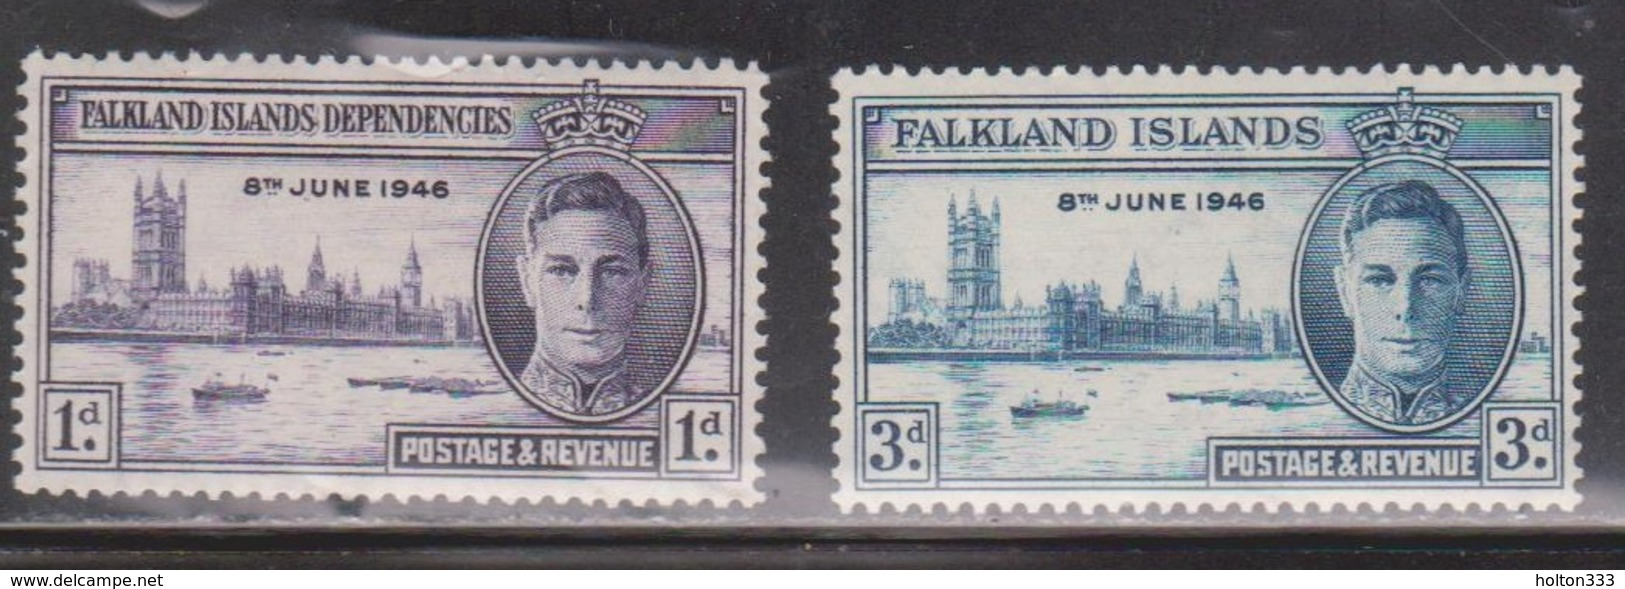 FALKLAND ISLANDS Scott # 97-8 MH - KGVI Peace Issue - Falkland Islands